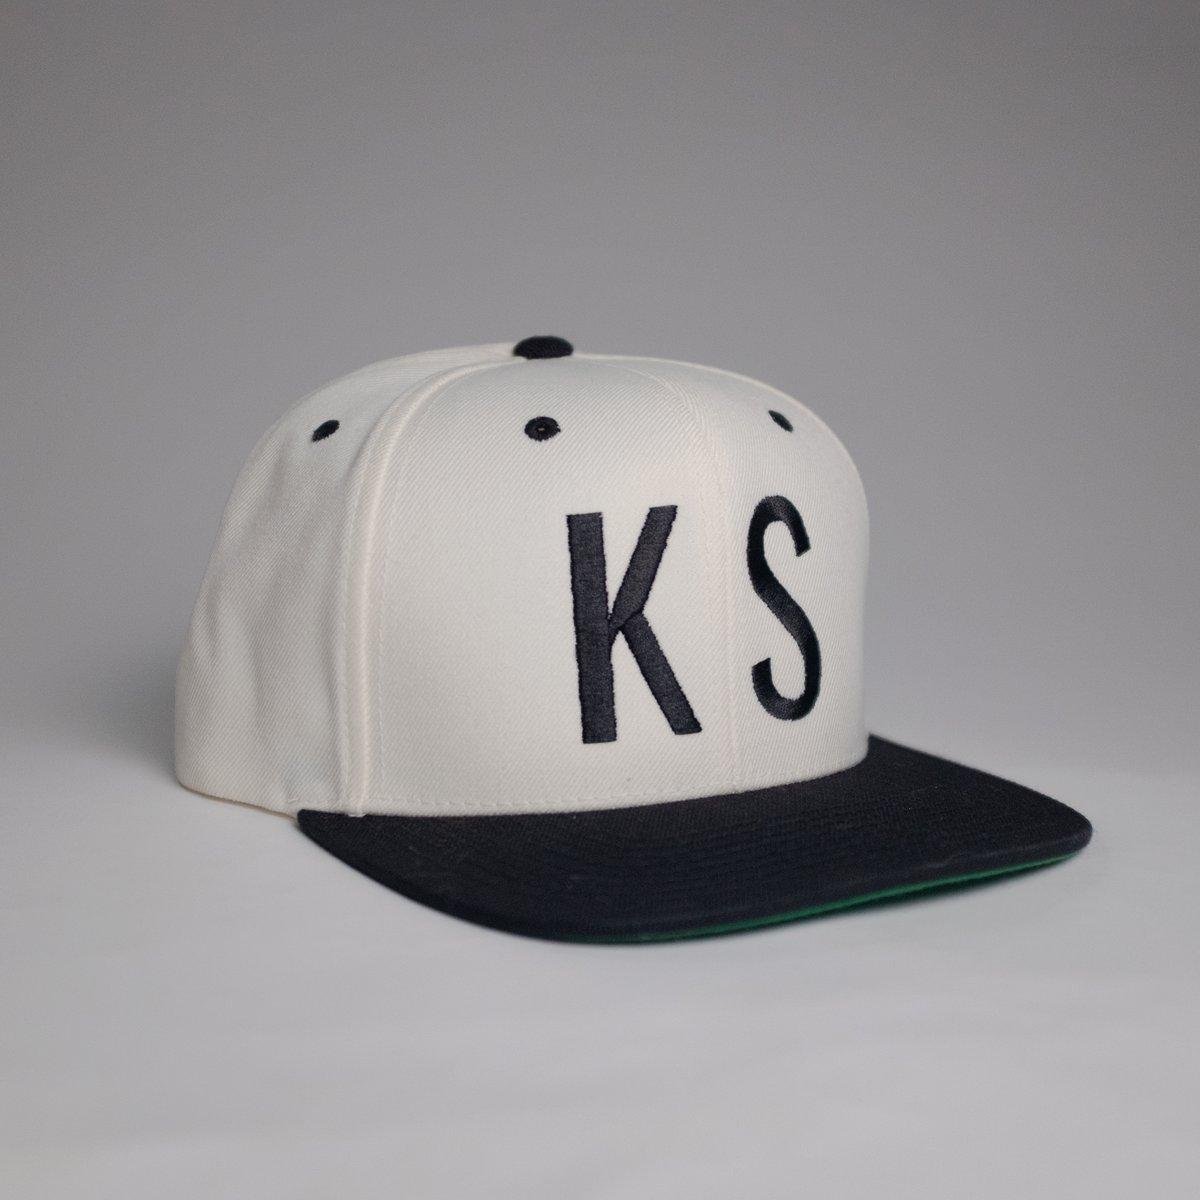 Image of KS Hat